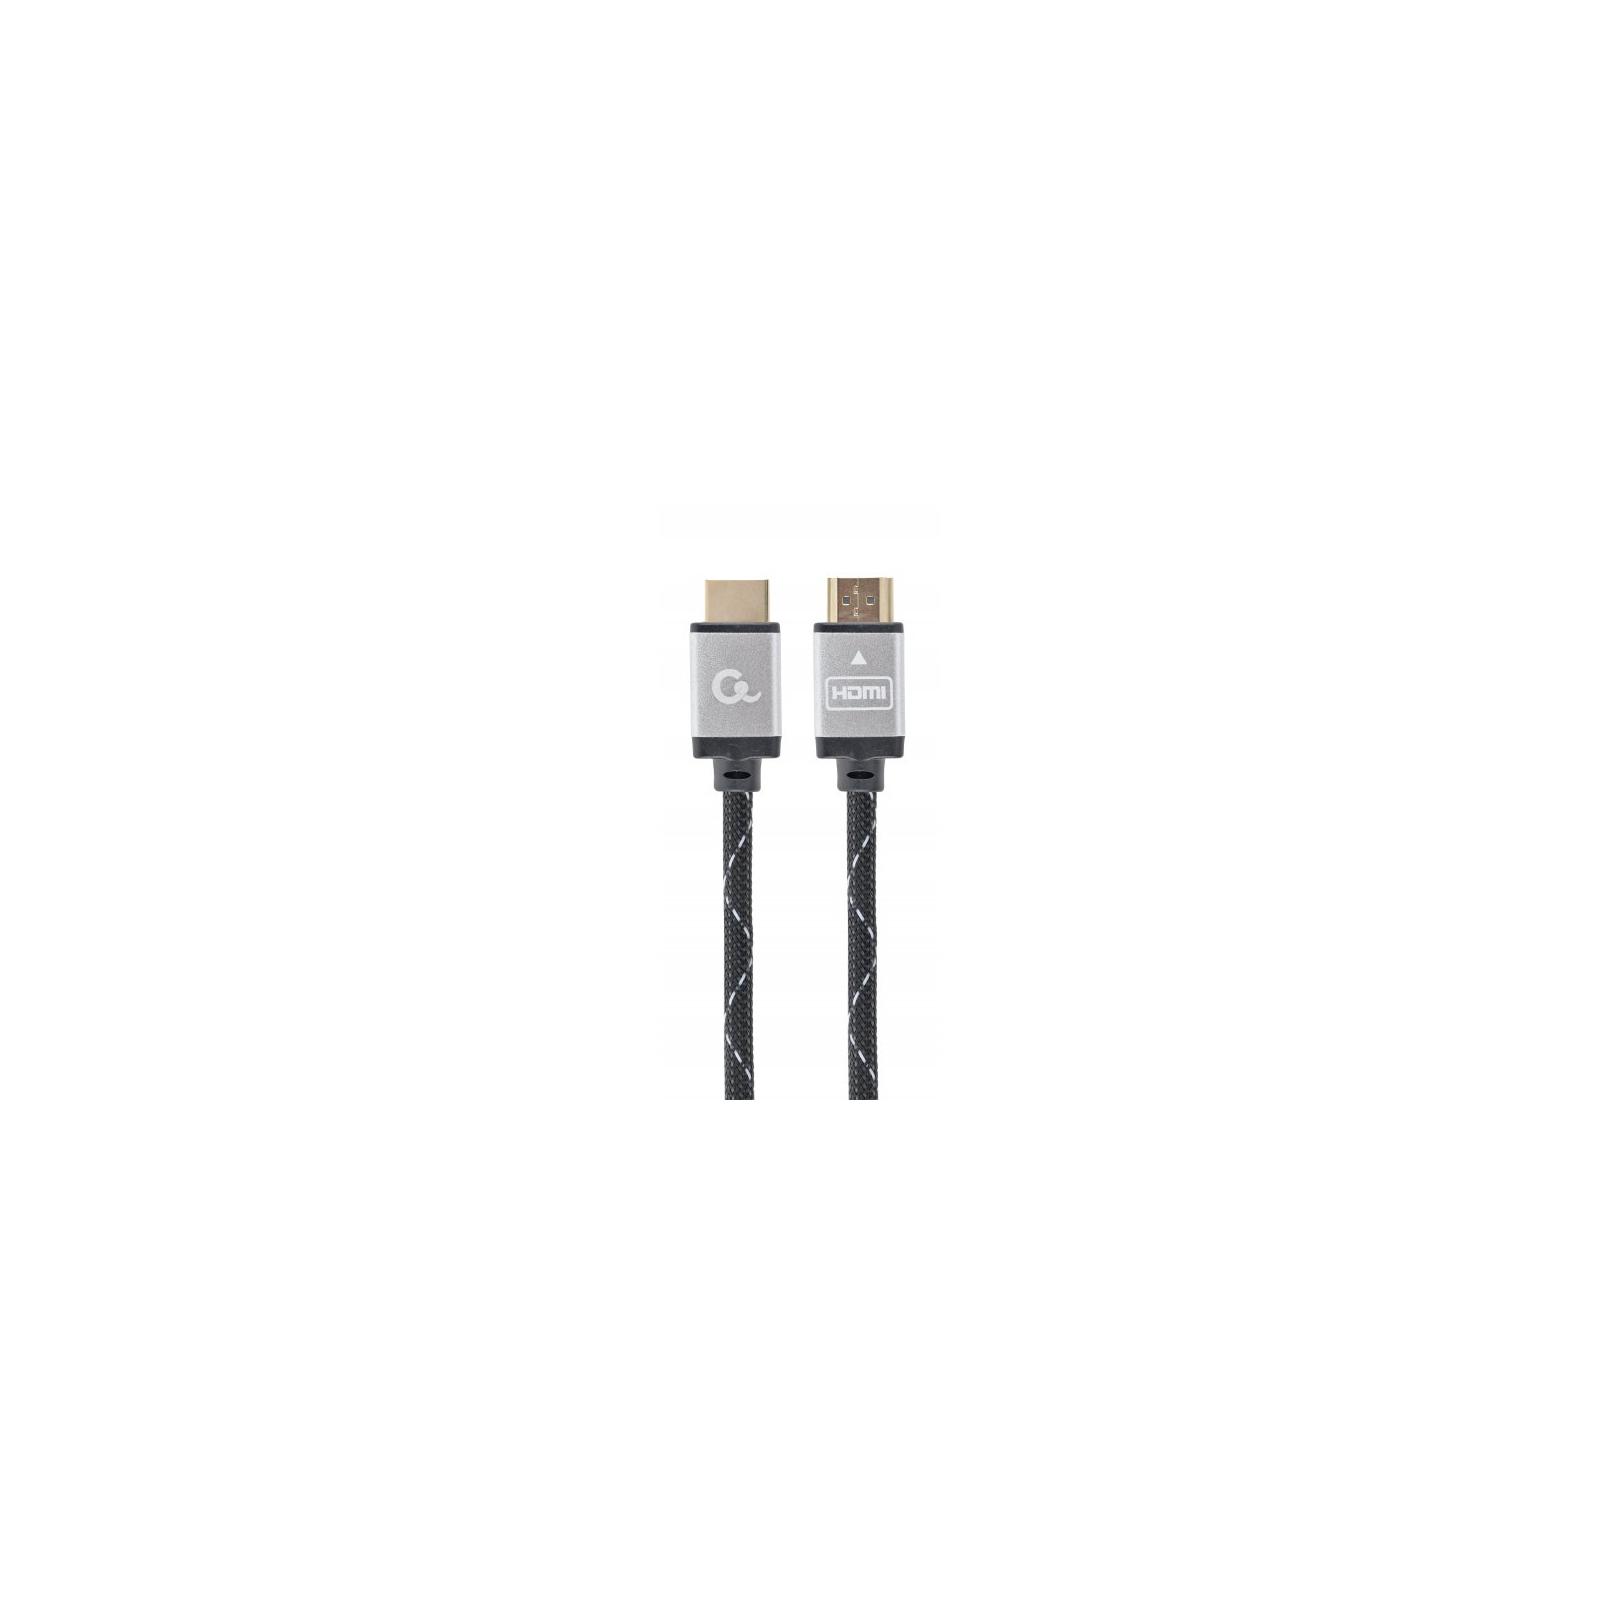 Кабель мультимедийный HDMI to HDMI 2.0m Cablexpert (CCB-HDMIL-2M)